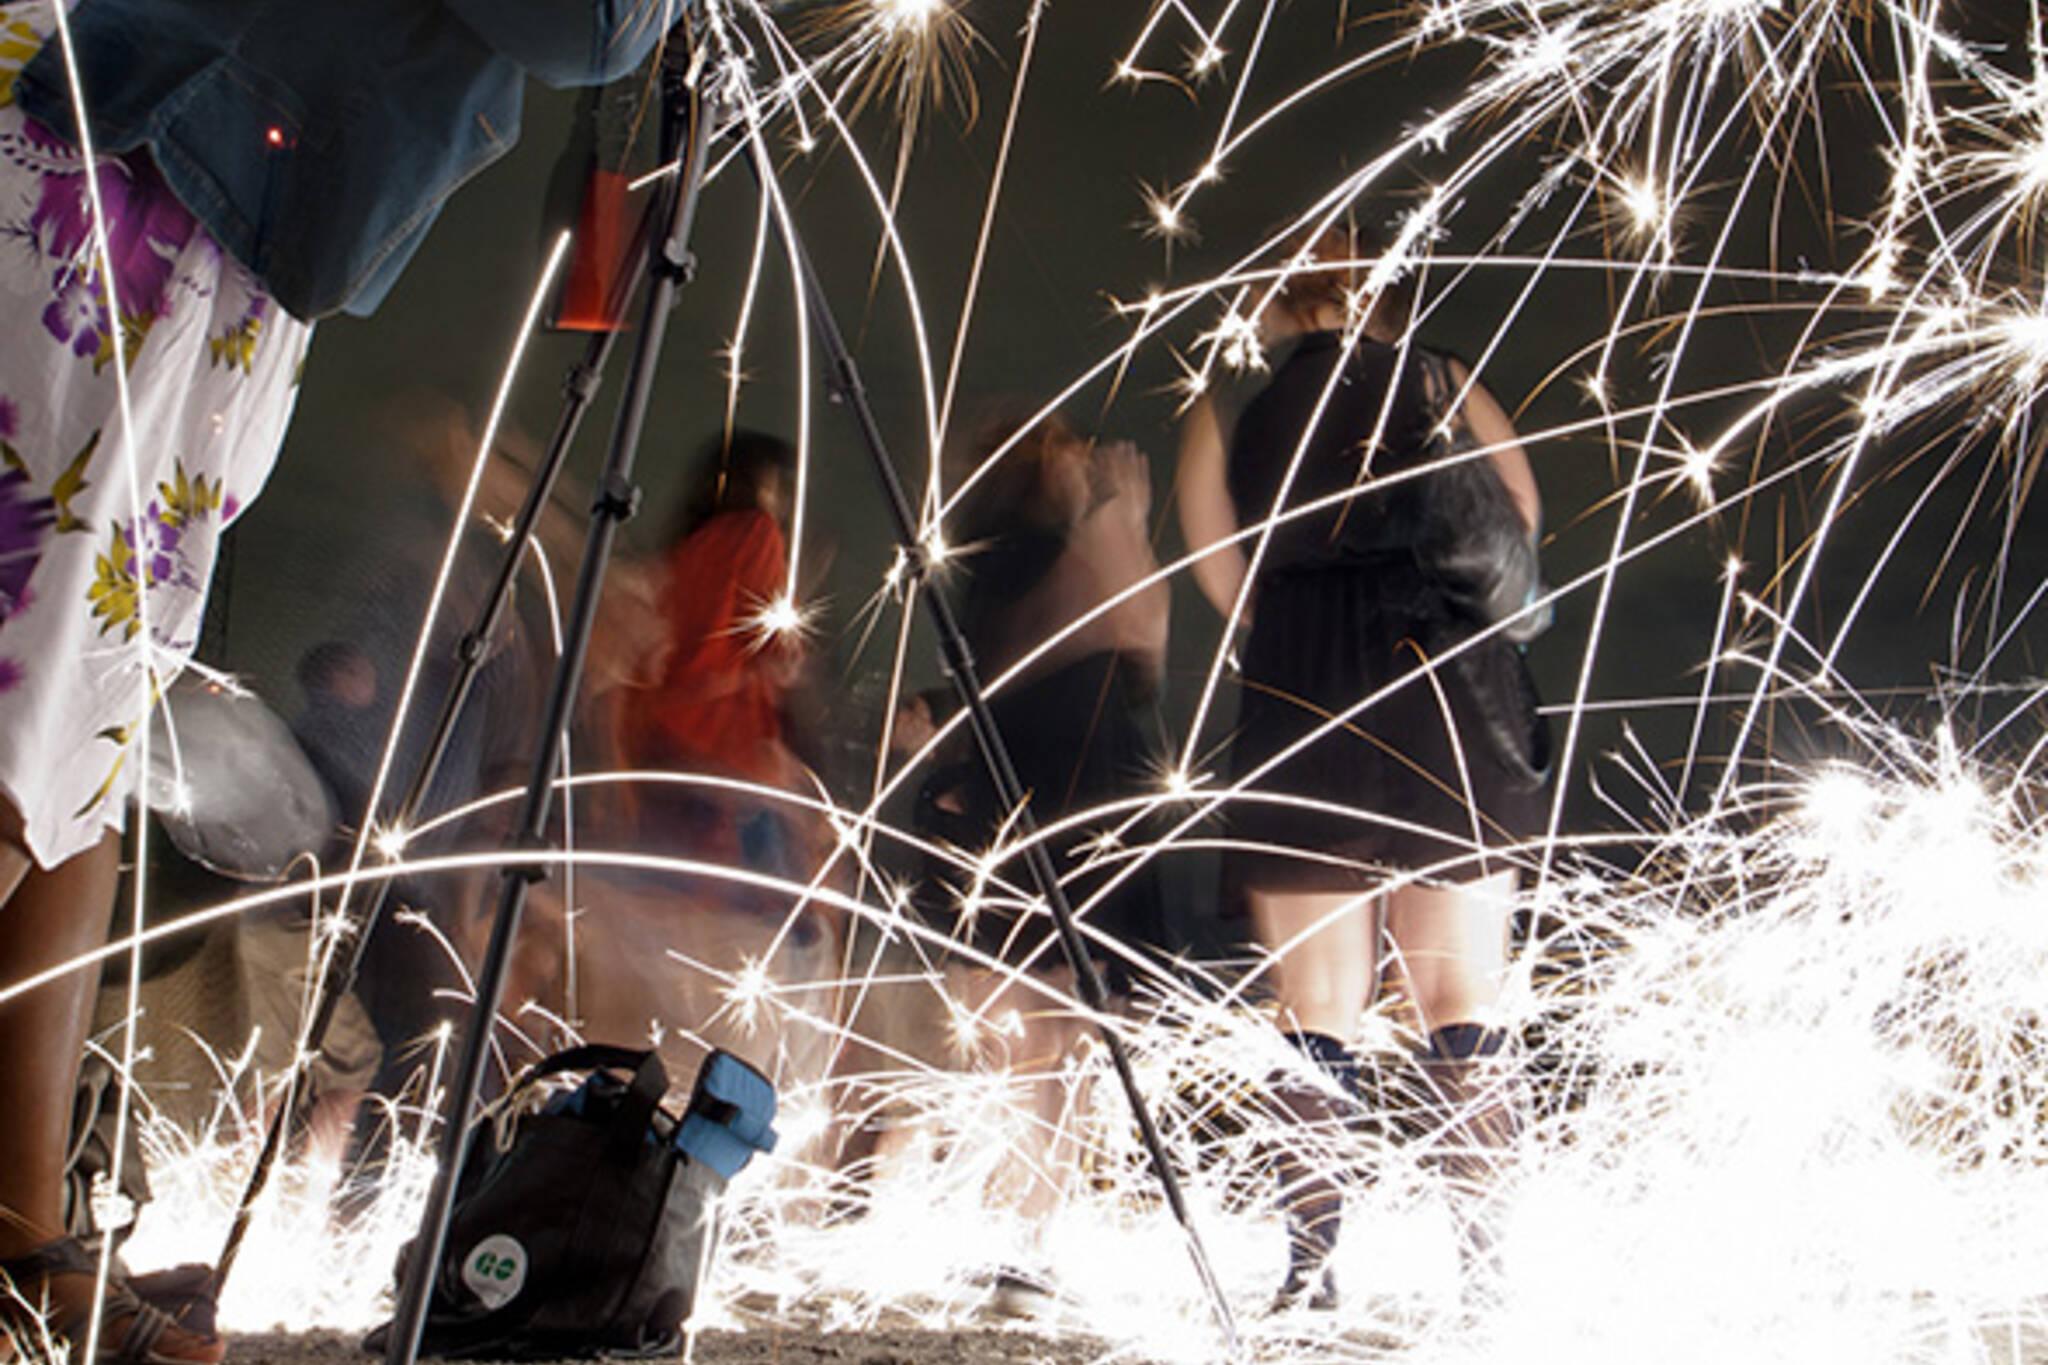 Victoria Day fireworks Toronto 2014